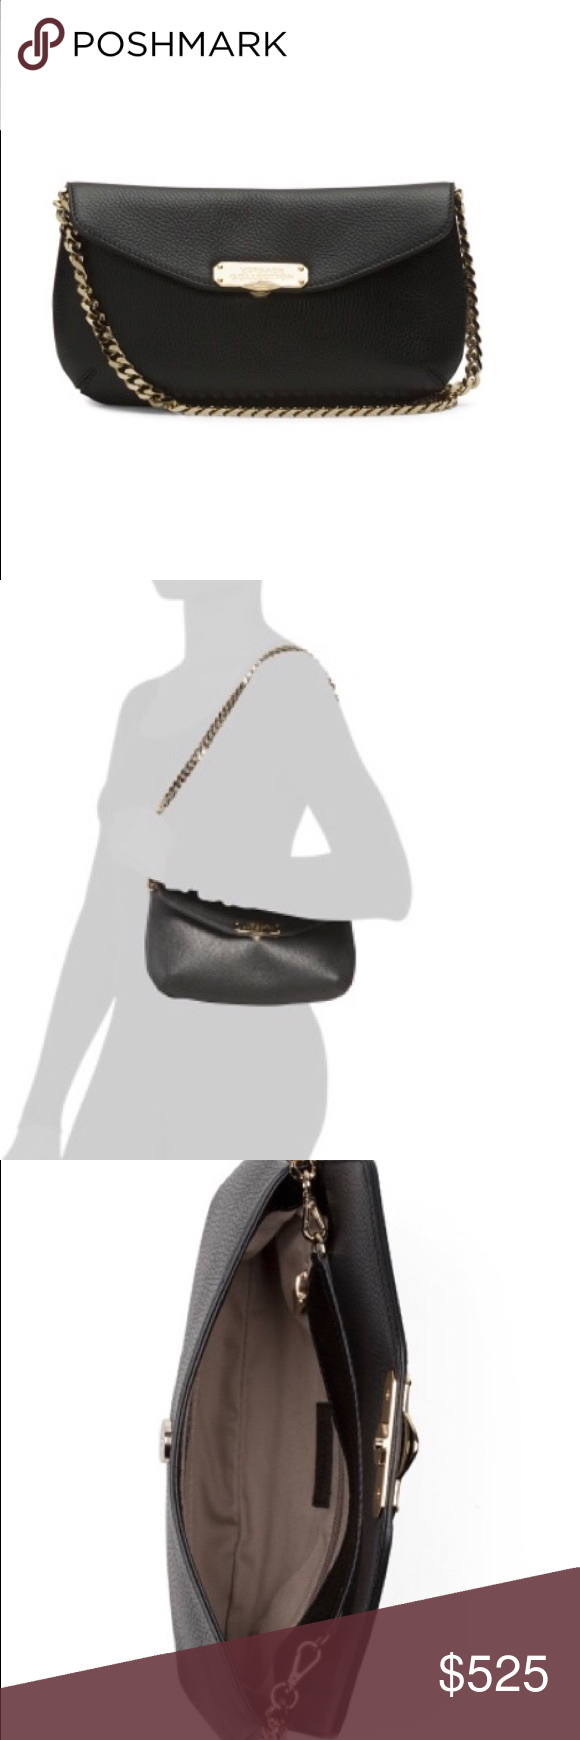 27e3c24ac46c3 Versace Small Bag Price